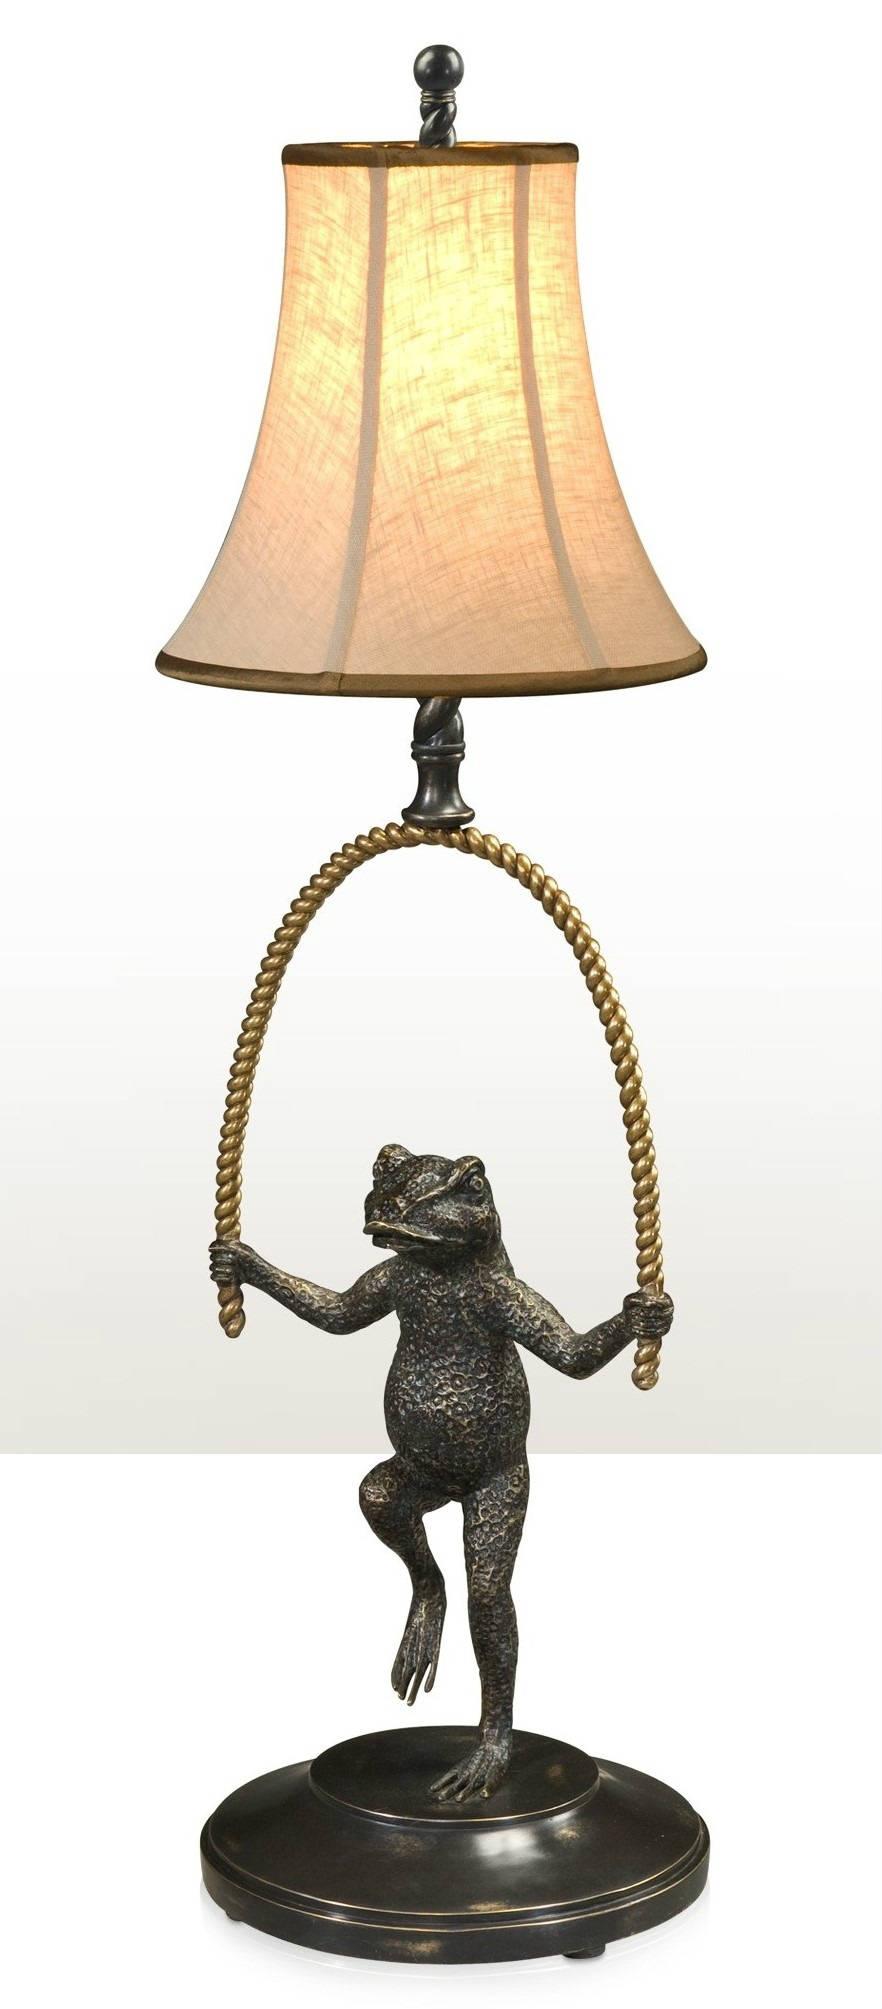 Verdigris brass frog table lamp